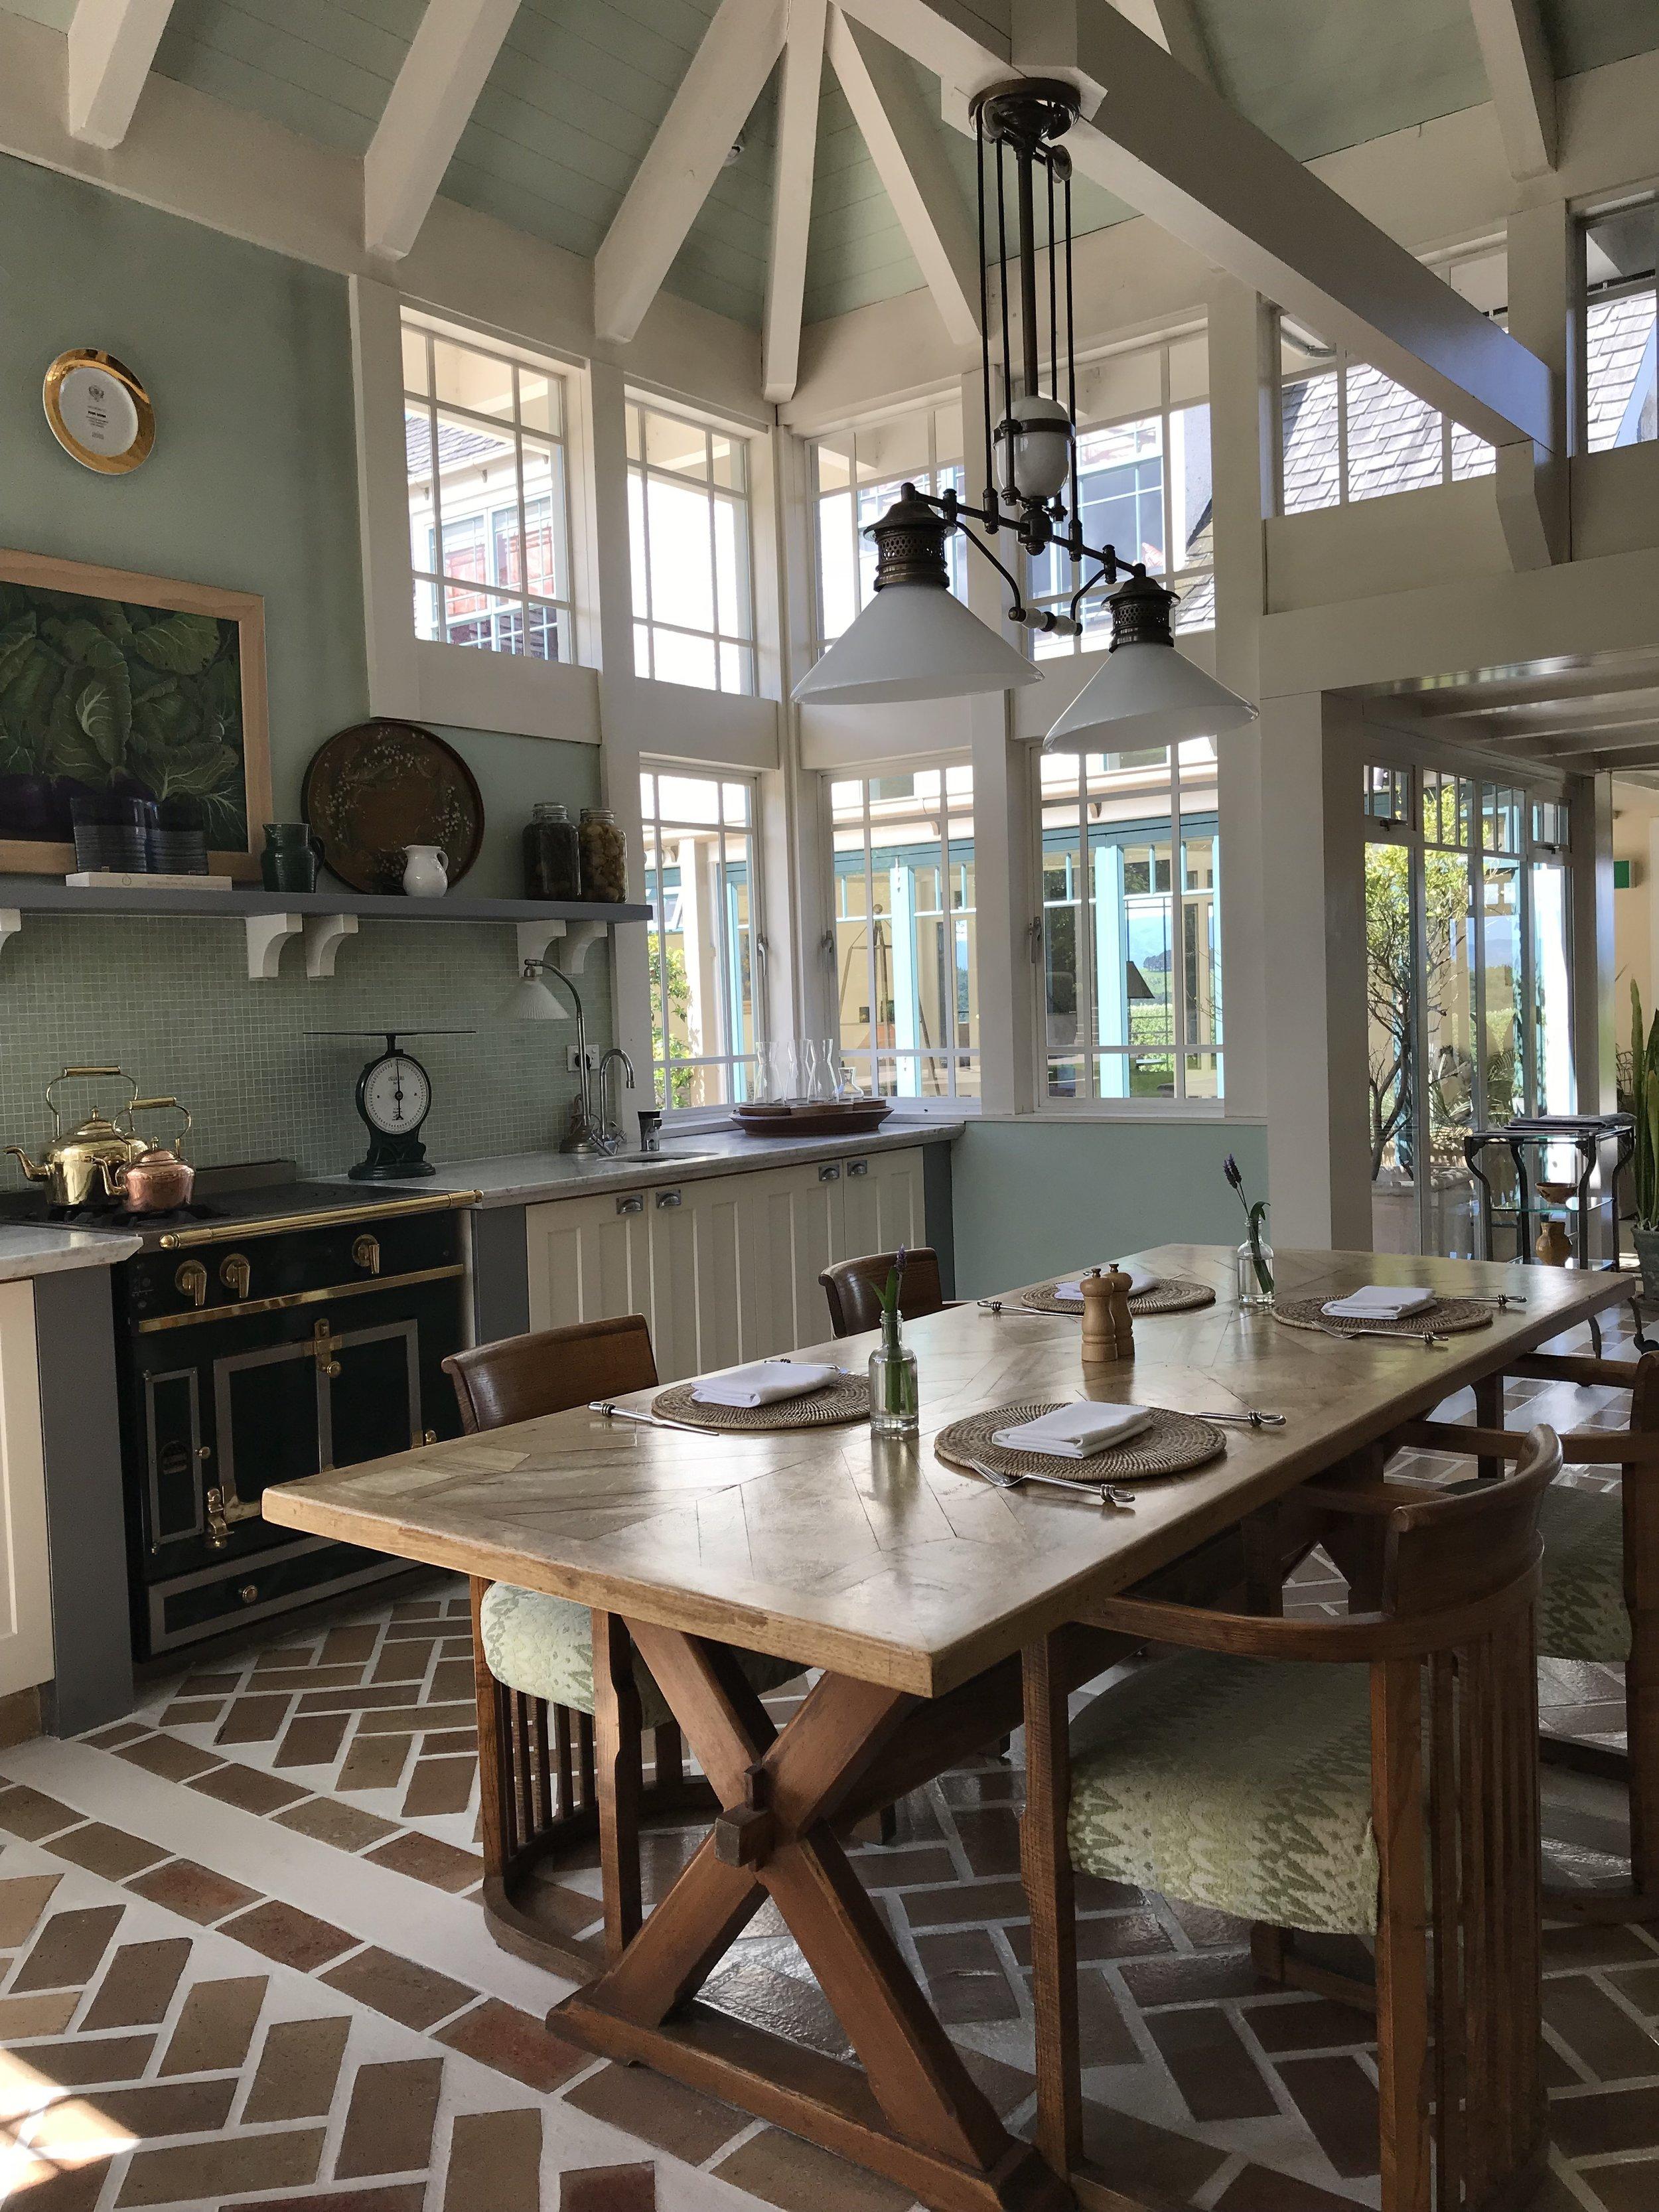 Country cottage kitchen of Wharekauhau (image by Jacqui Gibson).